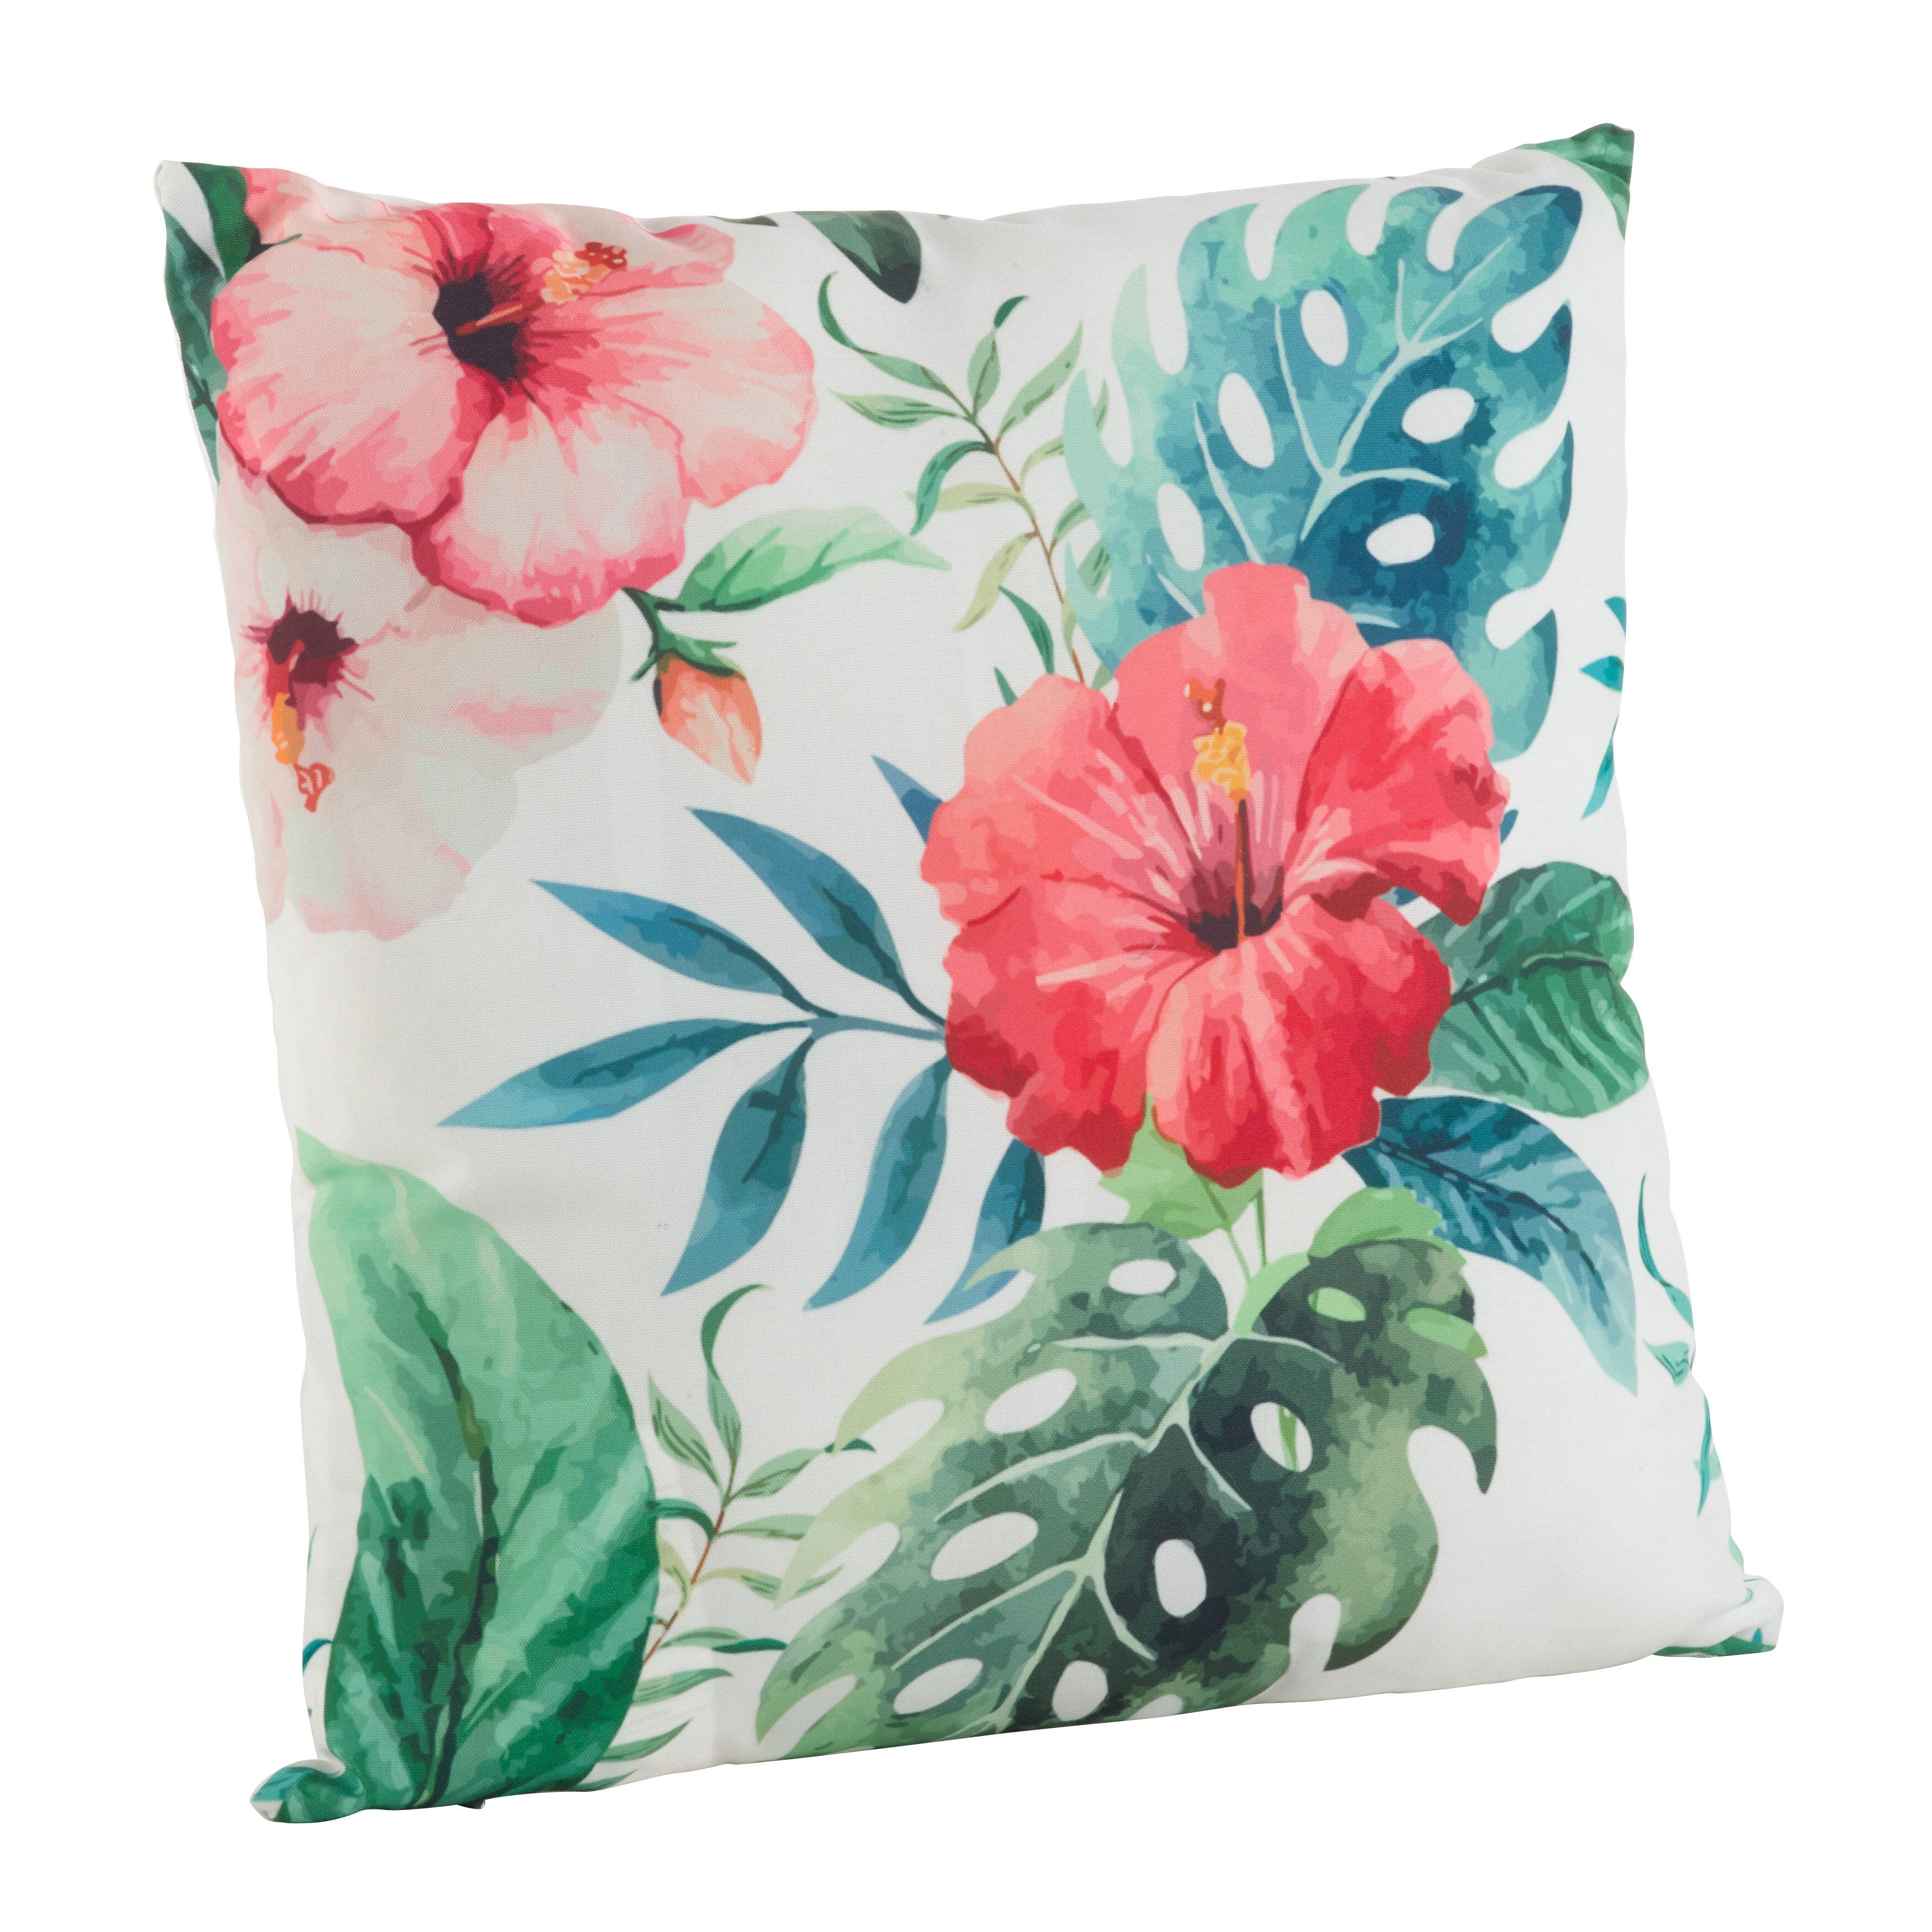 Sherwick Hibiscus Floral Tropical Print Indoor Outdoor Throw Pillow